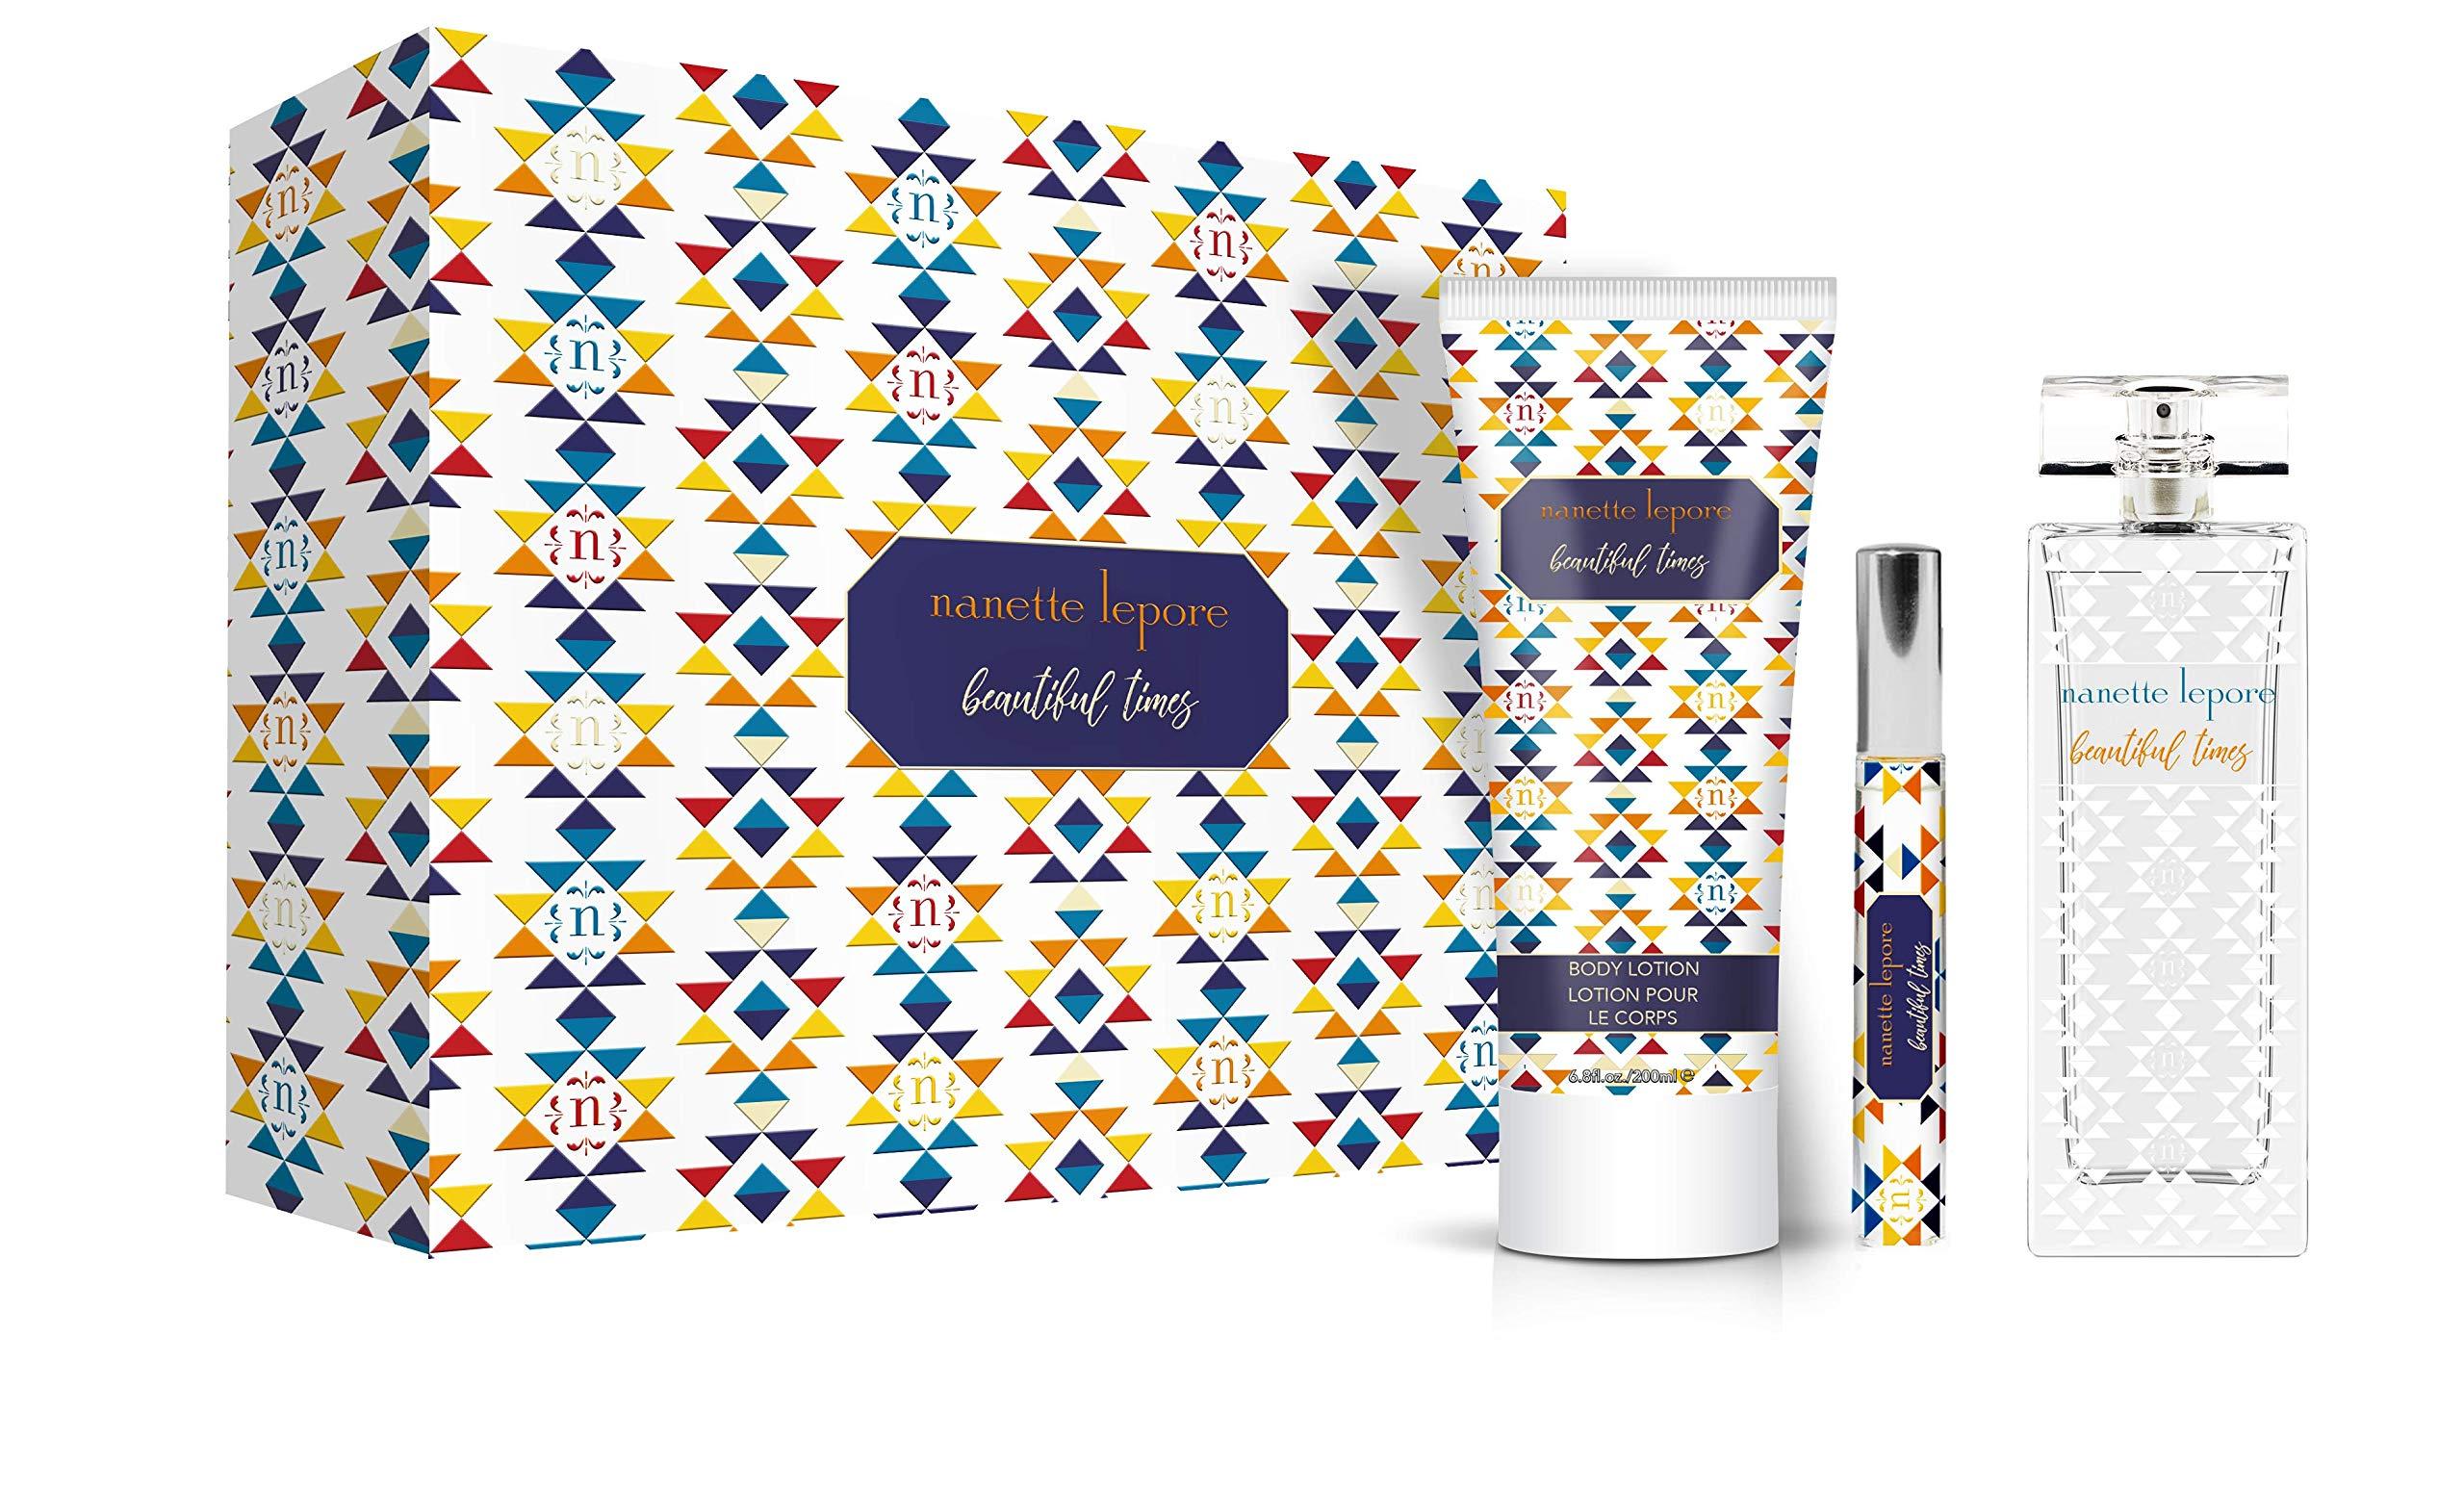 Nanette Lepore 3 Piece Gift Set, Beautiful Times, 3.4 Fluid Ounce by Nanette Lepore